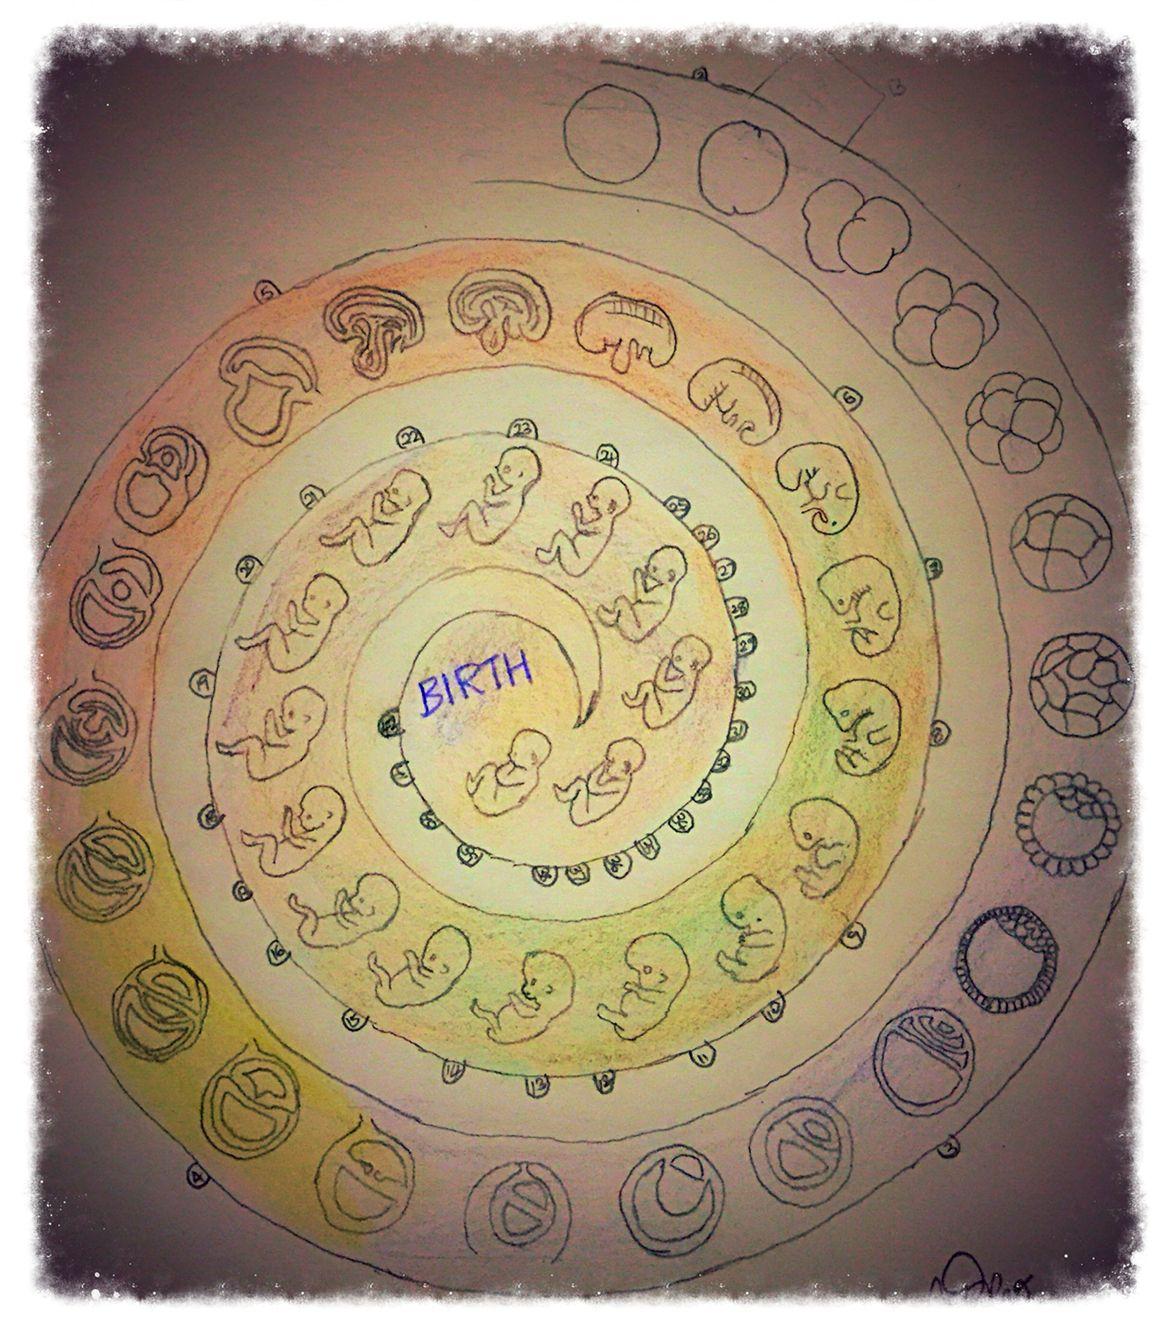 Human life cycle of birth